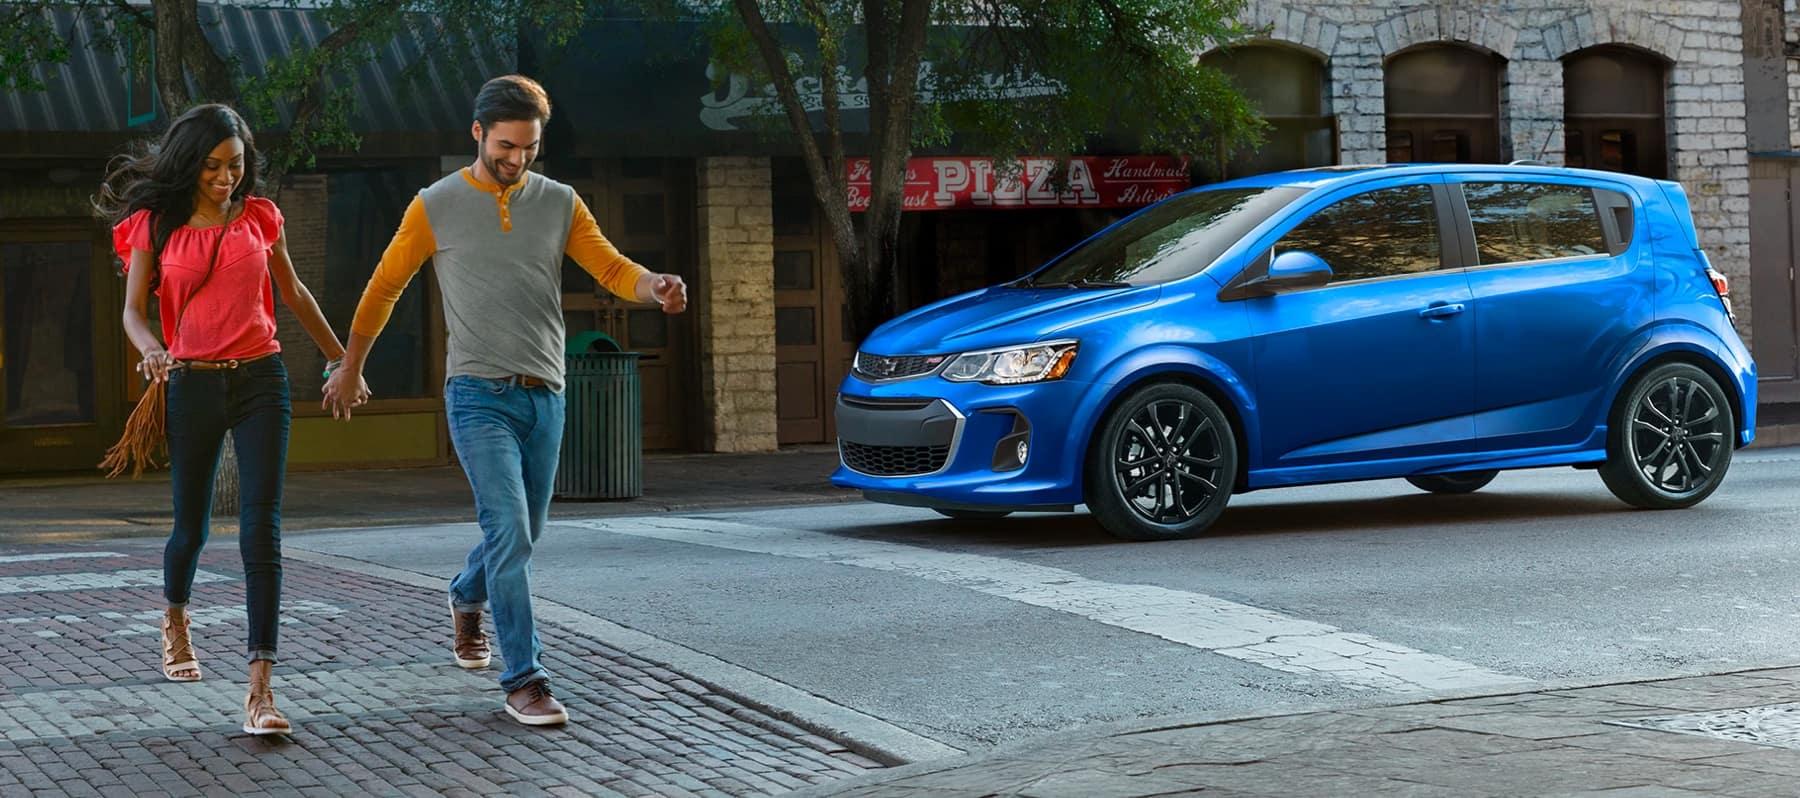 Couple walking across street in front of Chevrolet car